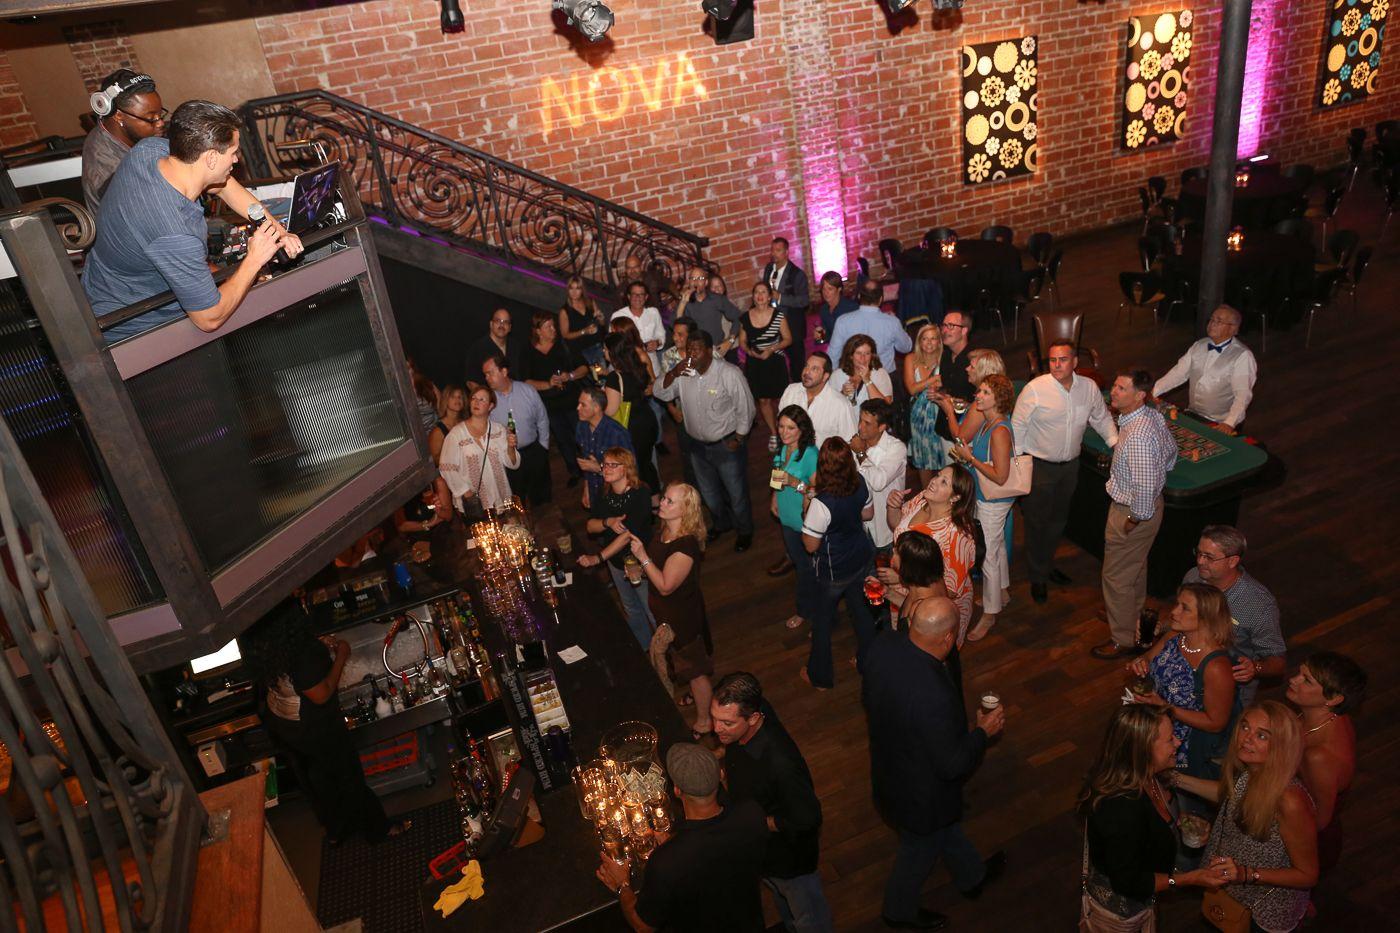 2015 07-24 Boca-Ciega-High-School-30th-Reunion-at-venue-NOVA-535-downtown-StPete-100